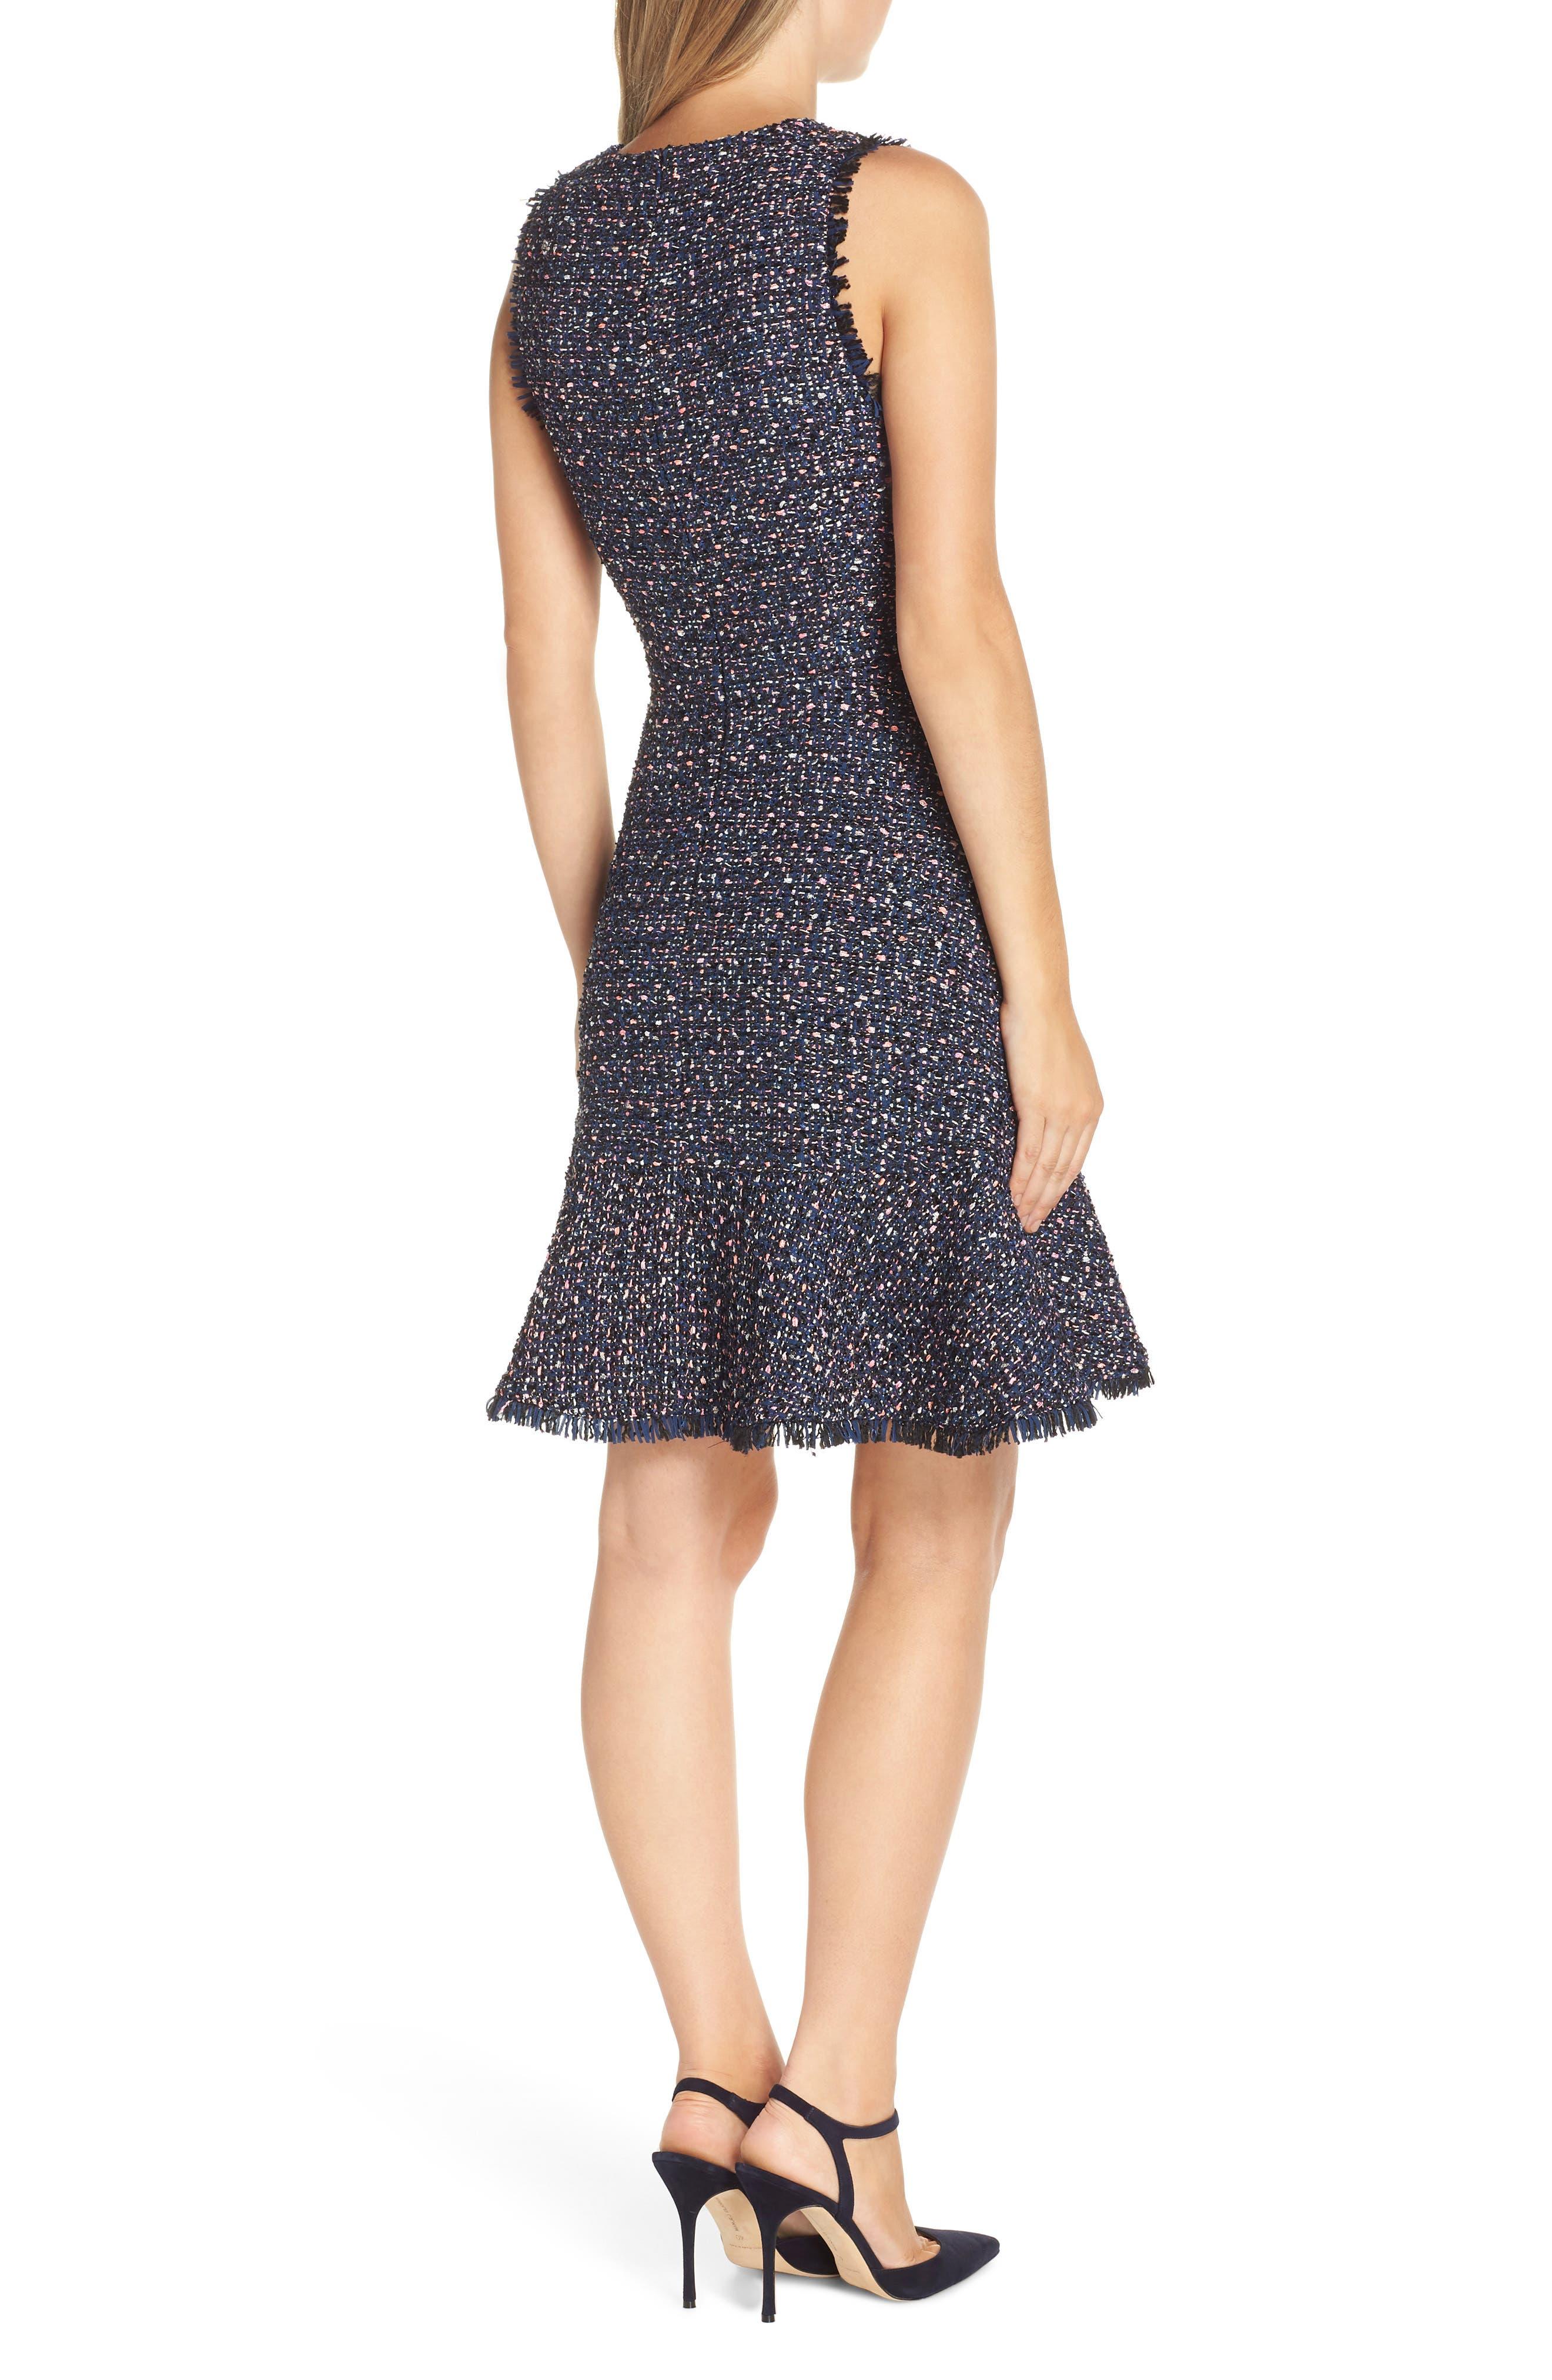 ELIZA J, Sleeveless Tweed Fit & Flare Dress, Alternate thumbnail 2, color, NAVY